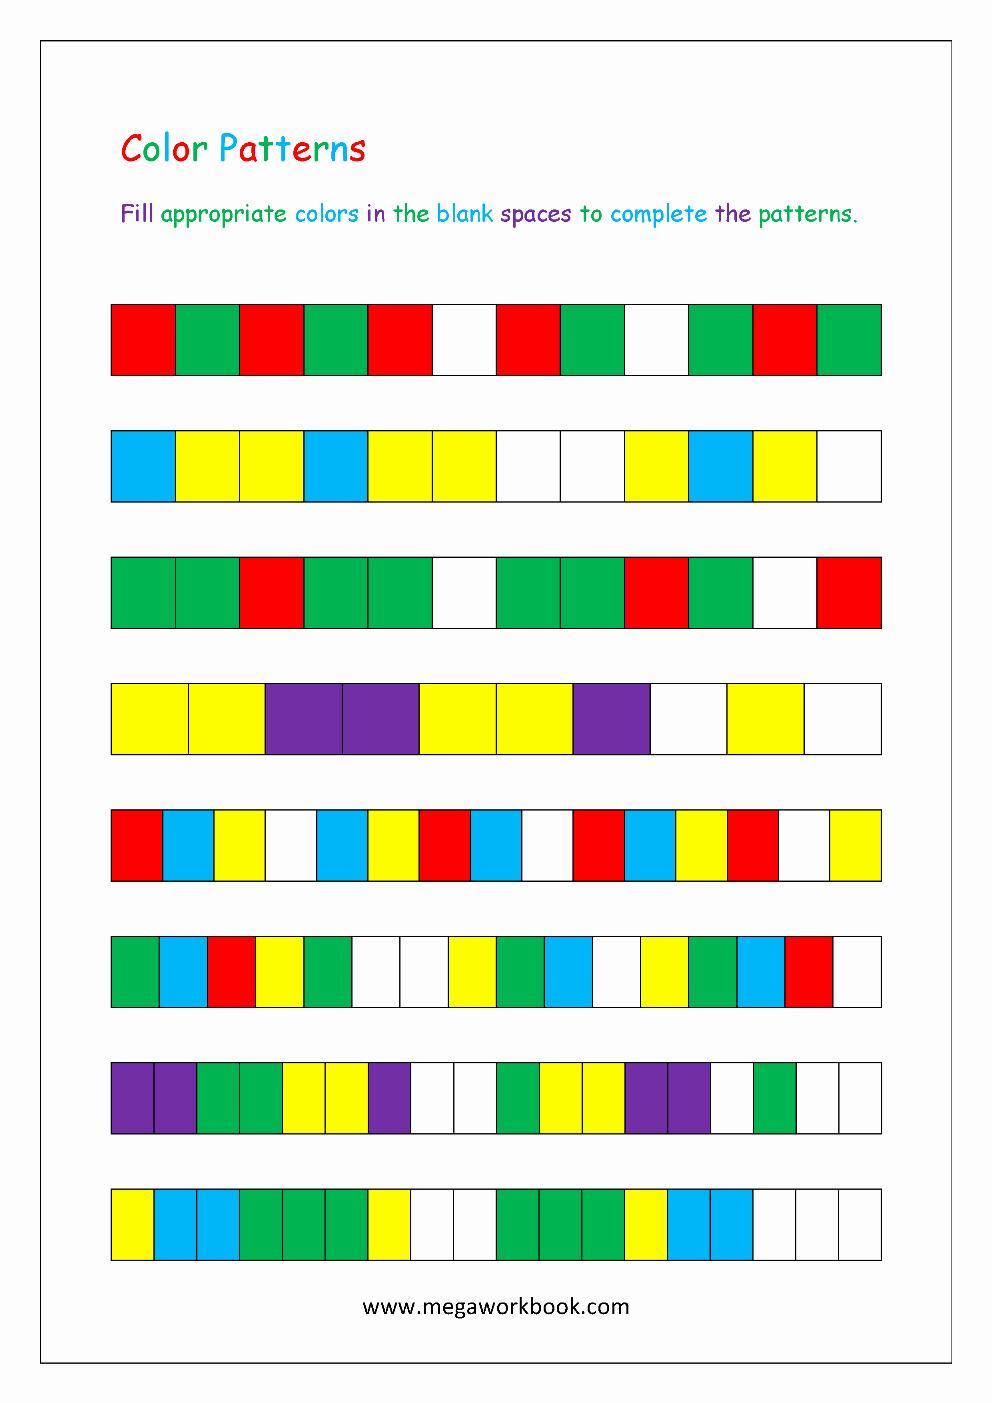 Repeated Pattern Worksheets Awesome Pattern Worksheets for Kindergarten Color Patterns